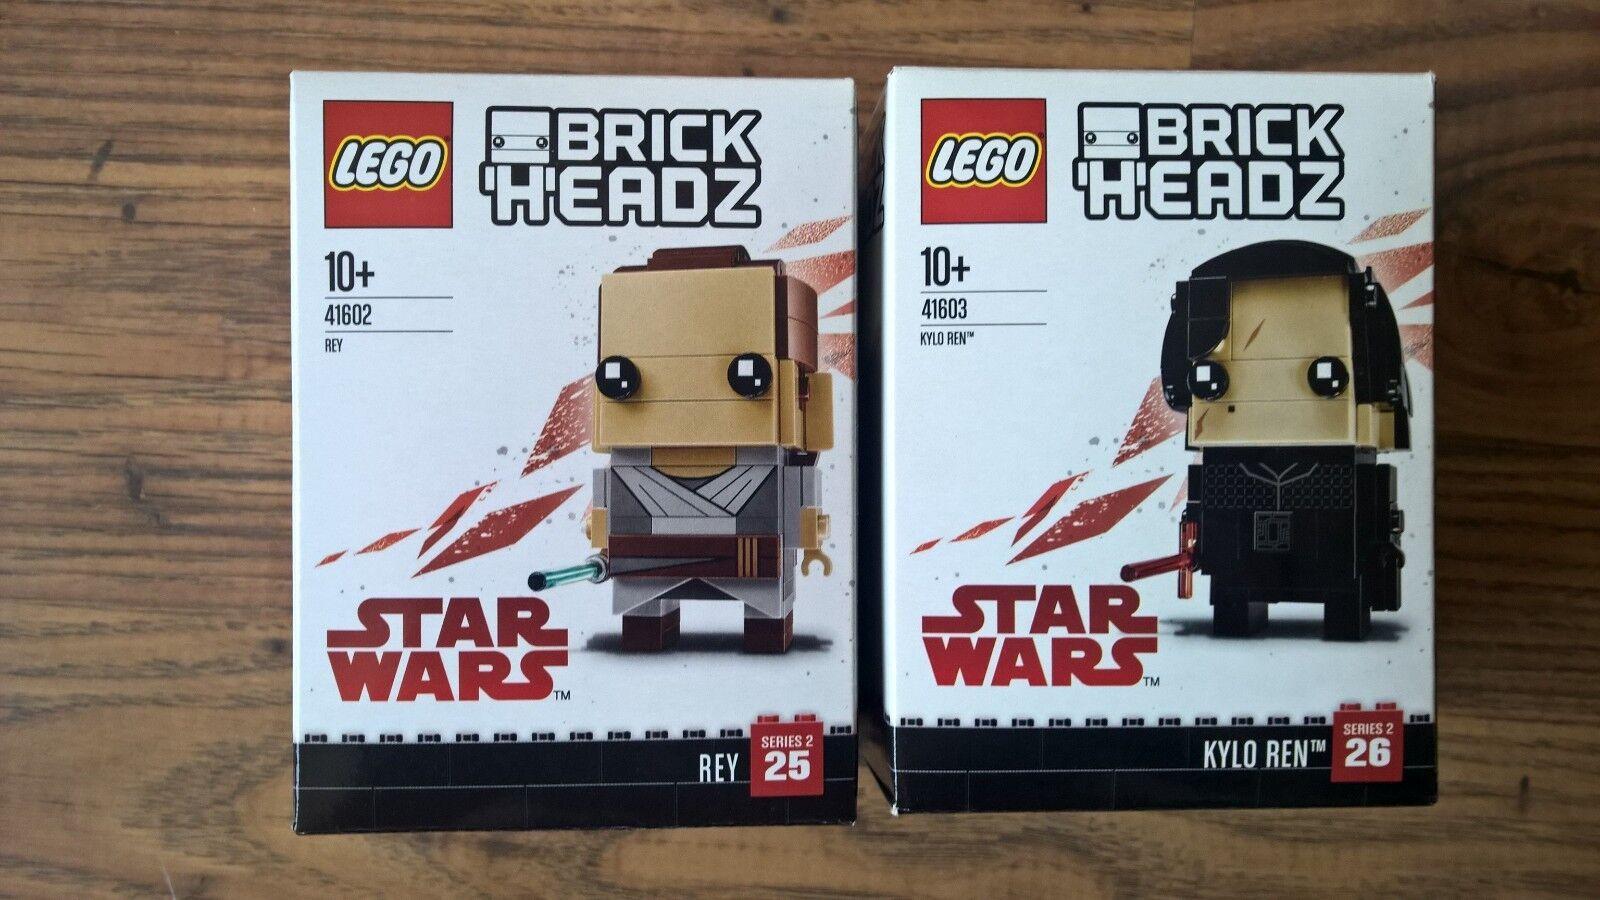 LEGO 41602 AND 41603 - REY AND KYLO REN - STAR WARS - BRICKHEADZ - NEW  SEALED